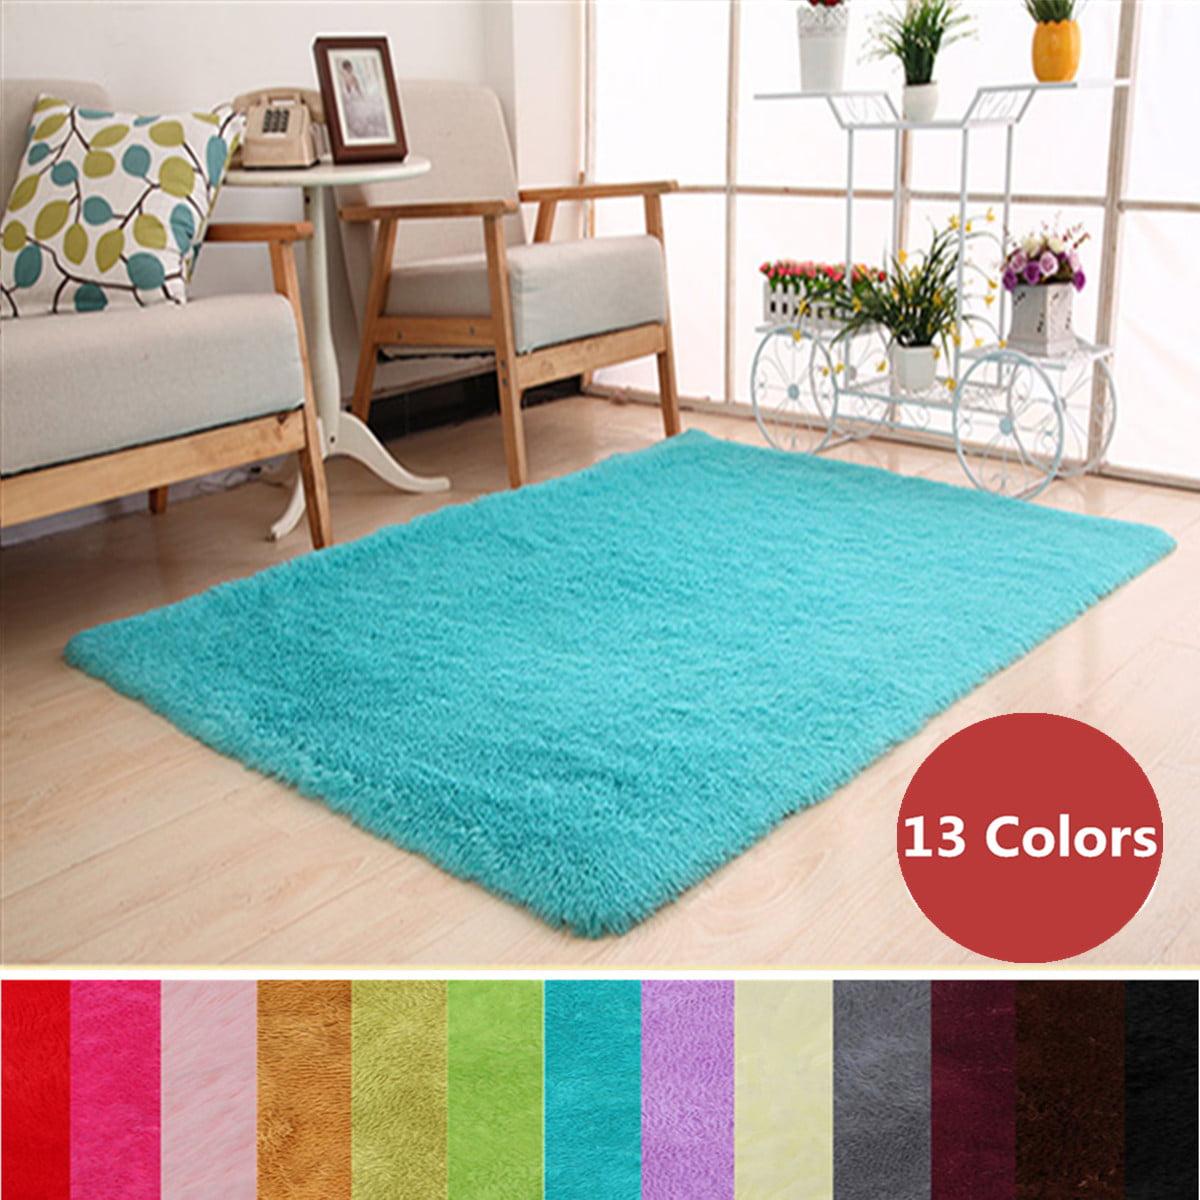 48x32 Inch Modern Soft Fluffy Floor Doormat Rug Anti Skid